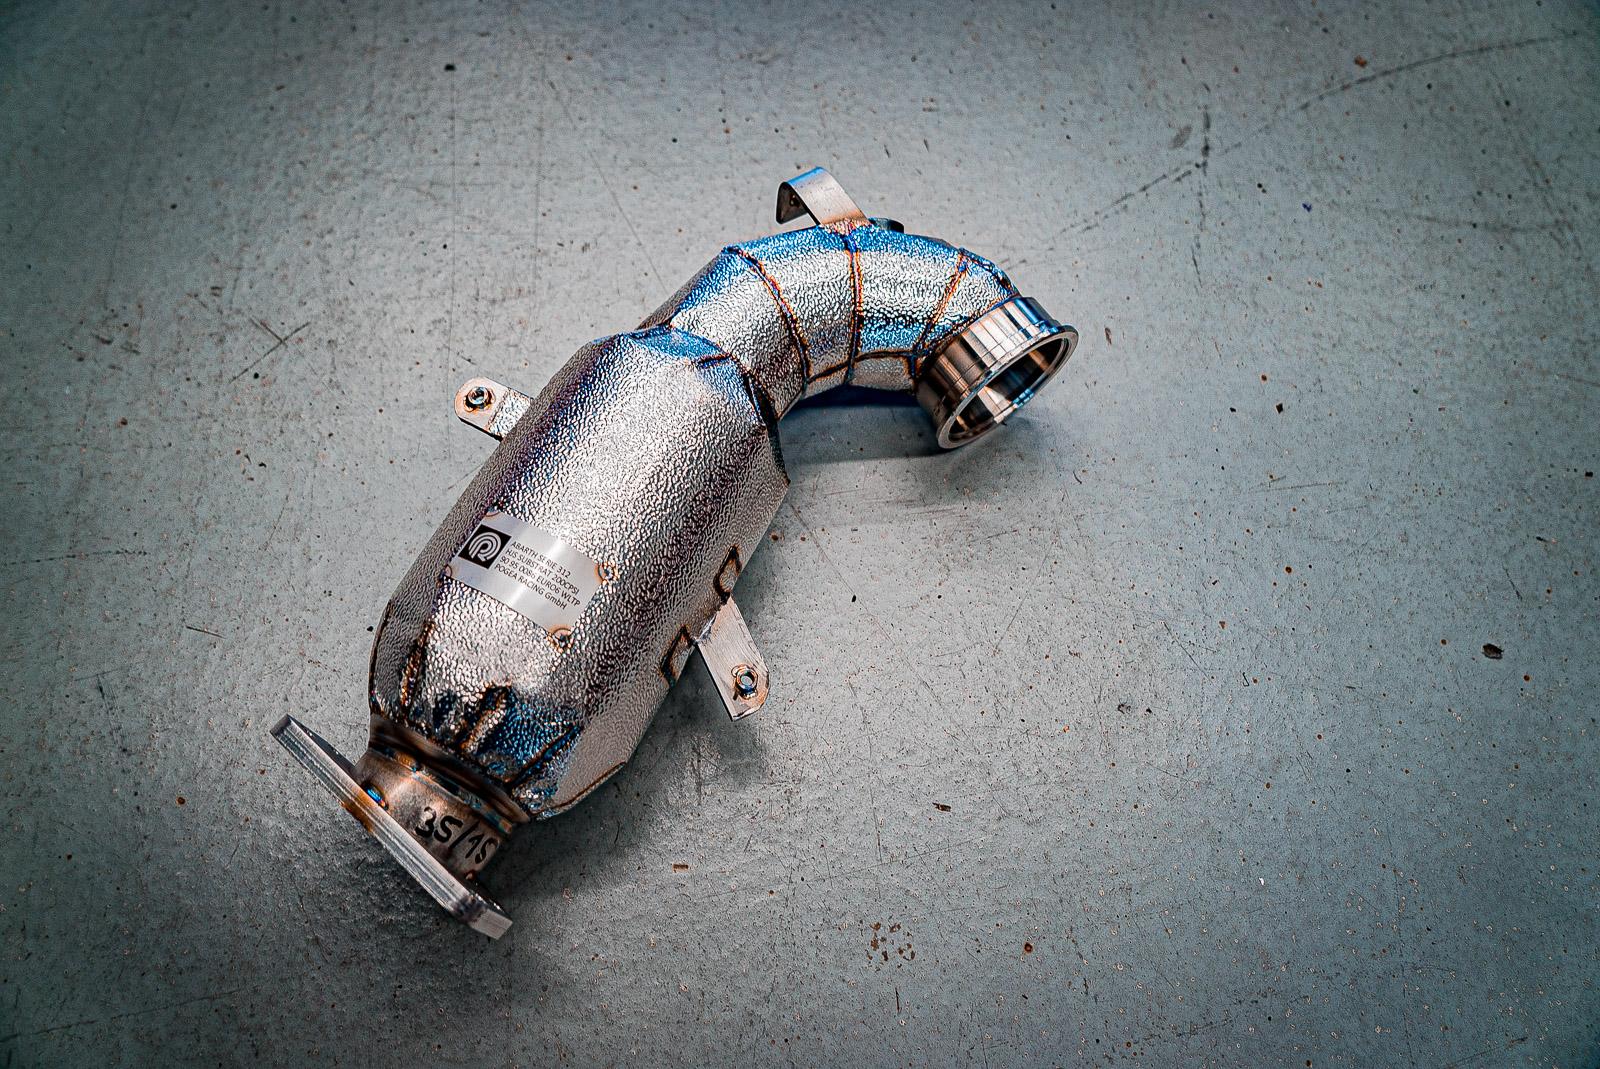 Abarth 595 Leistungssteigerung Stage1k 205PS inkl. Downpipe 200CPSI Grobkorn/Kalotte